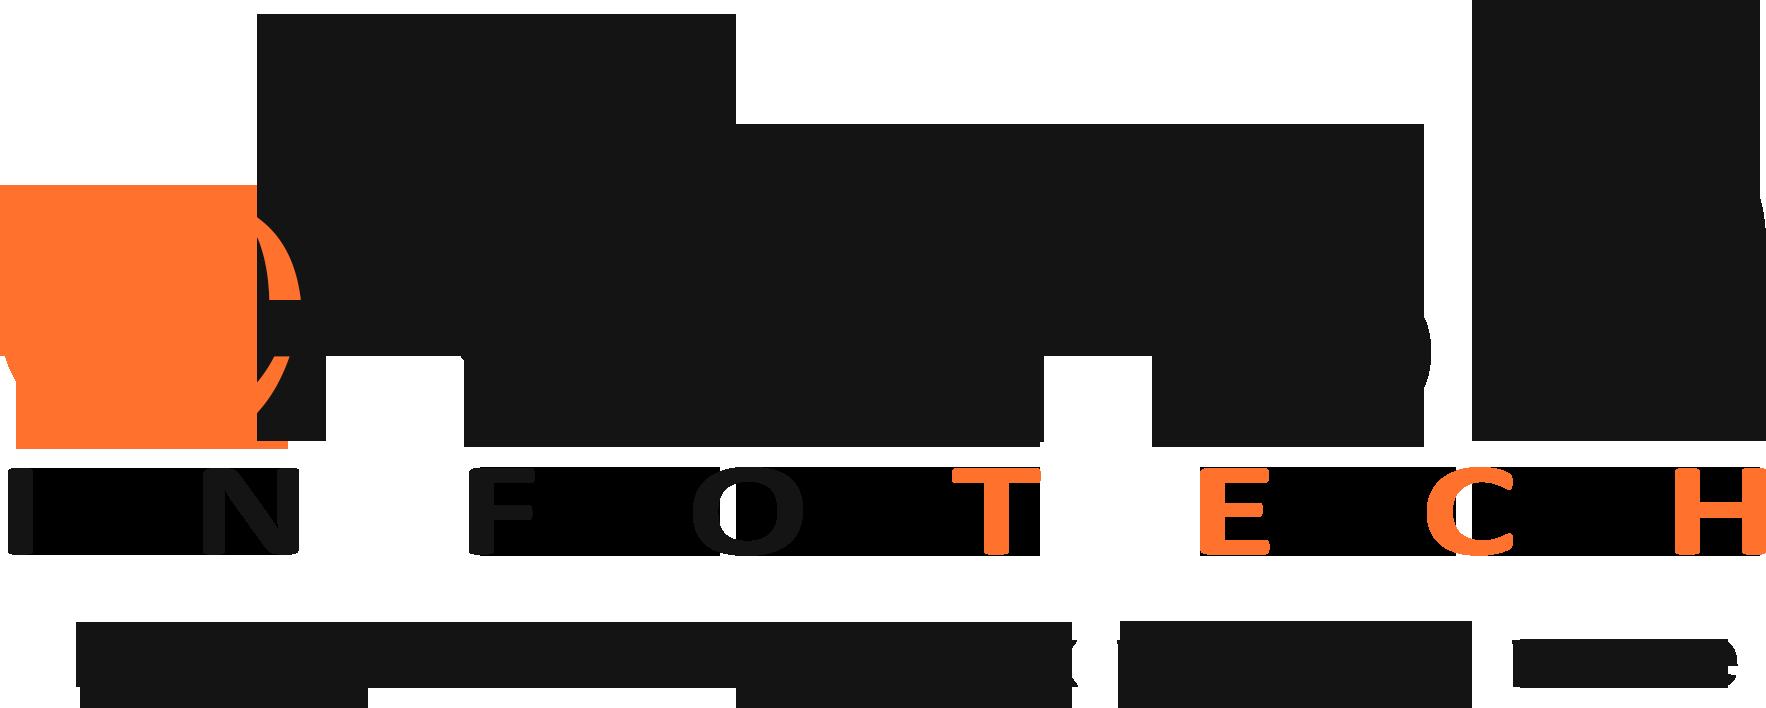 API Development | eKarsh Infotech - PHP Web Development | Android